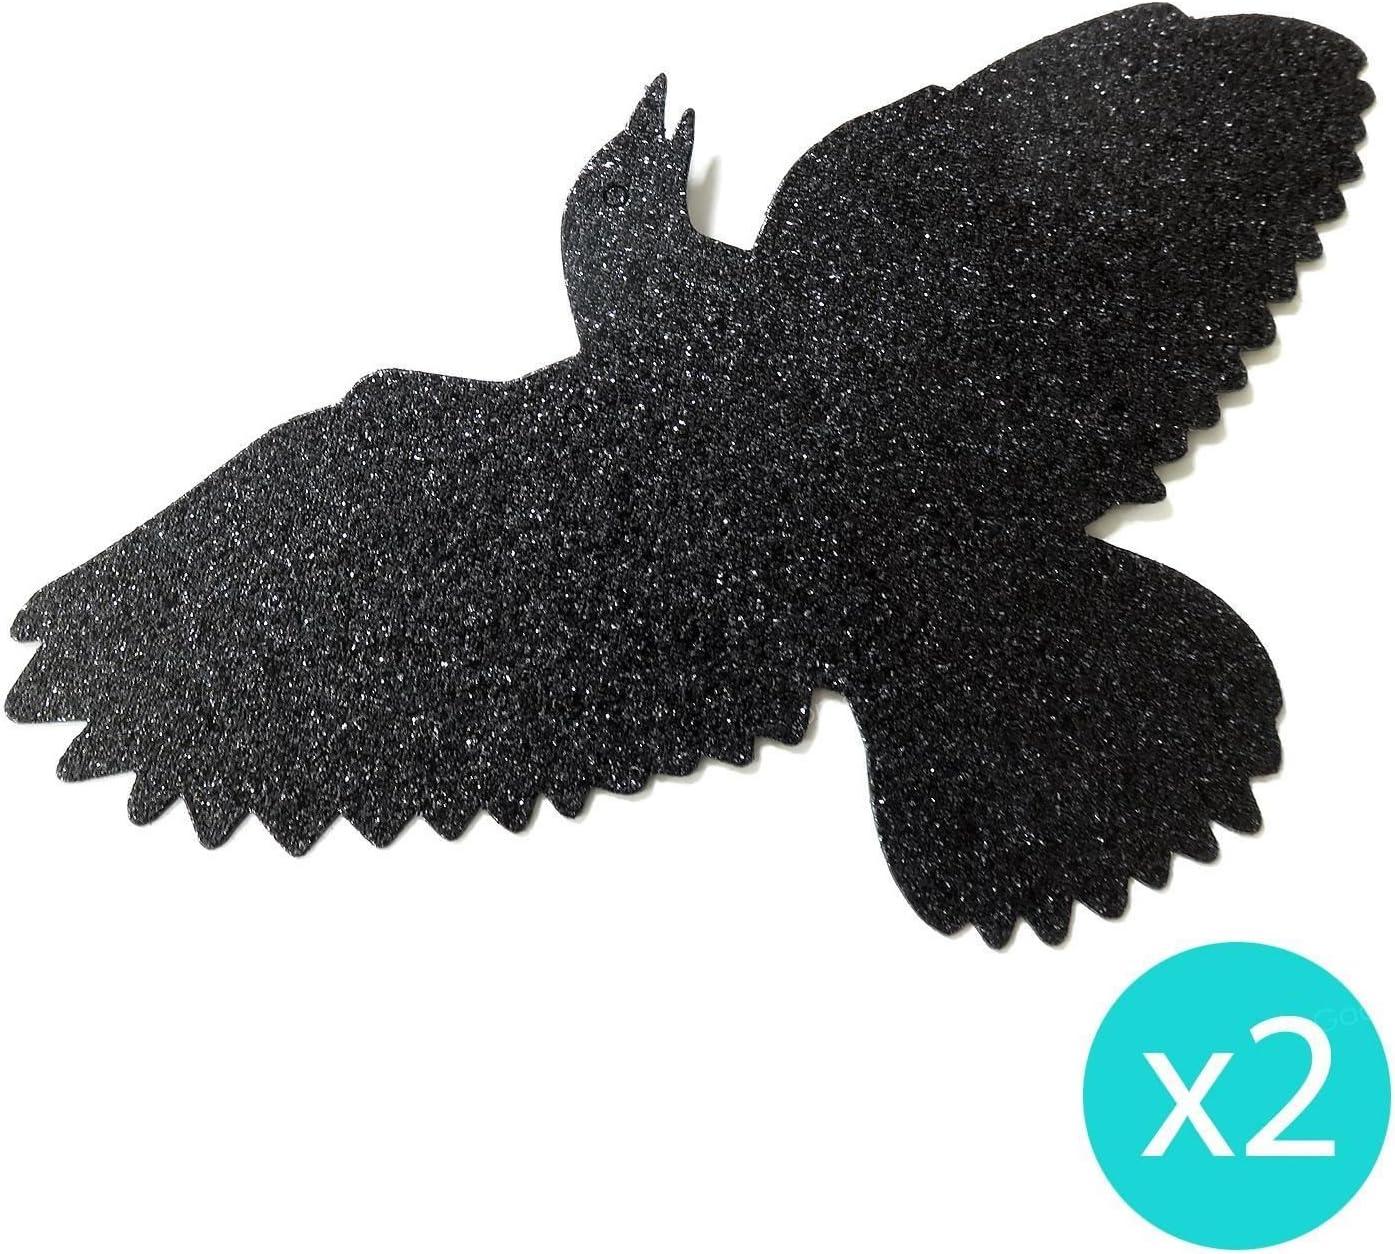 Crows Spiders 17 Pieces Glitter Chandelier Kit Halloween Horror Hanging Party Decorations Bats Skulls